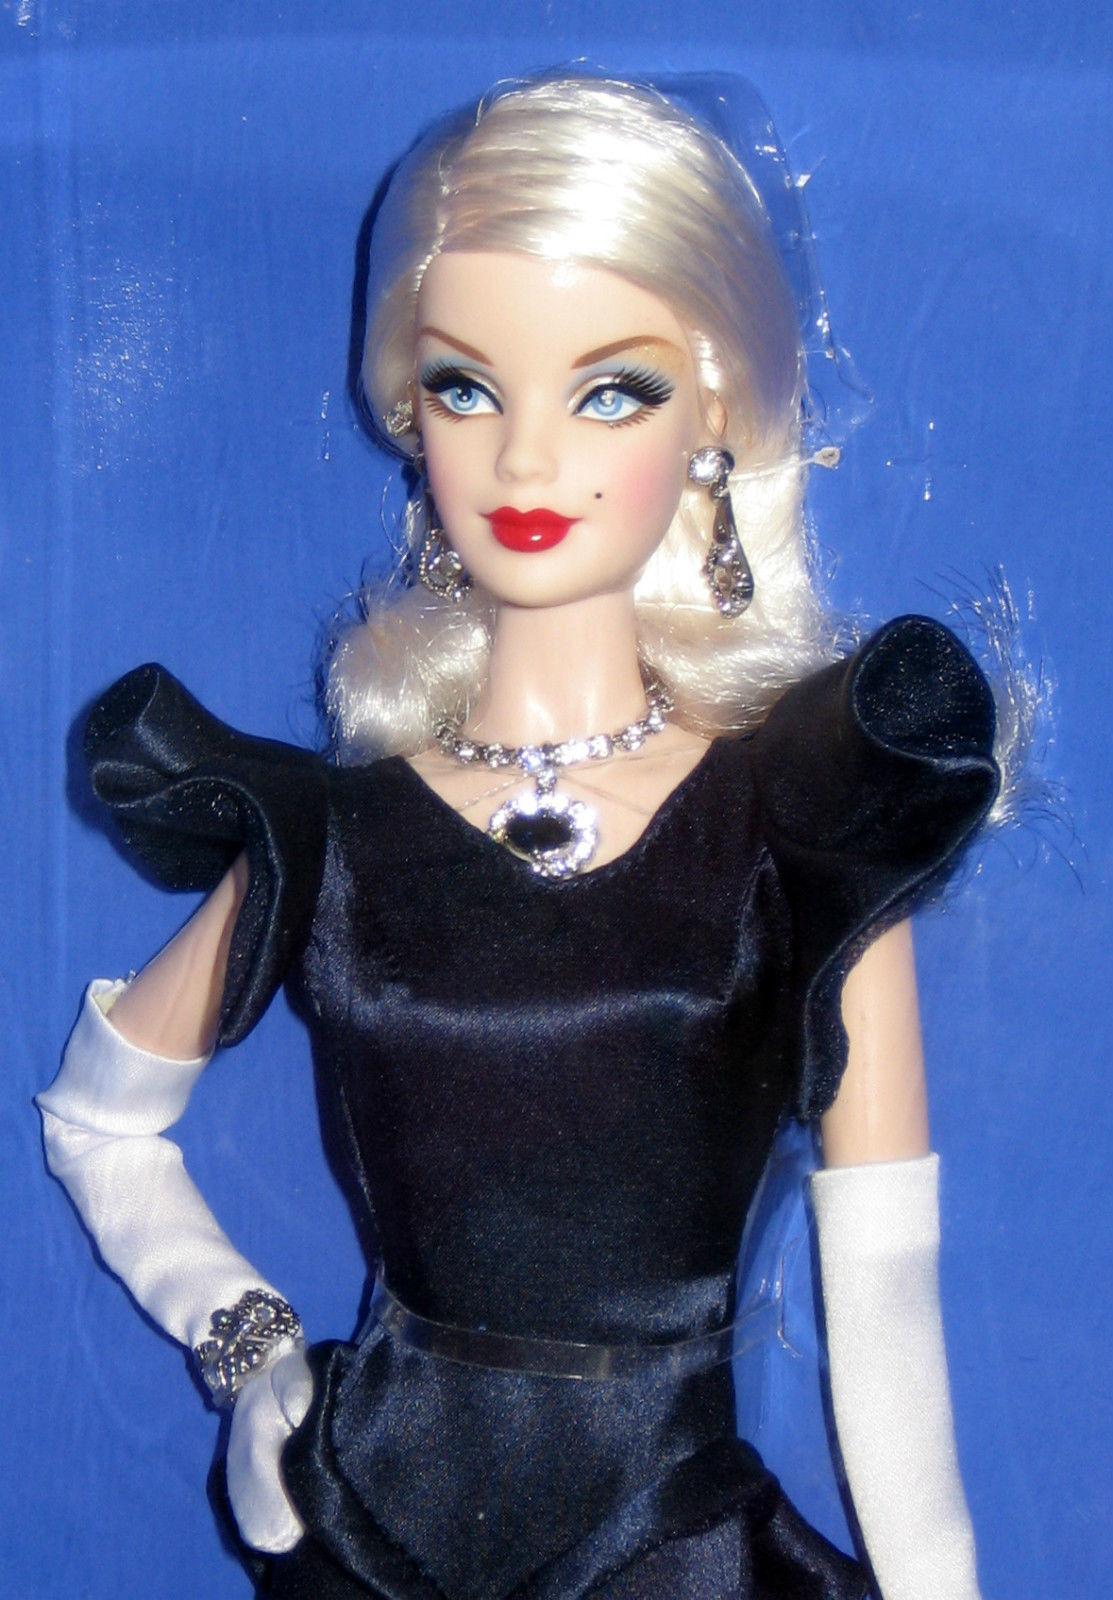 NRFB   HOPE DIAMOND     Barbie blond 2012 CONVENTION auf 180 Stück limitiert dcf274